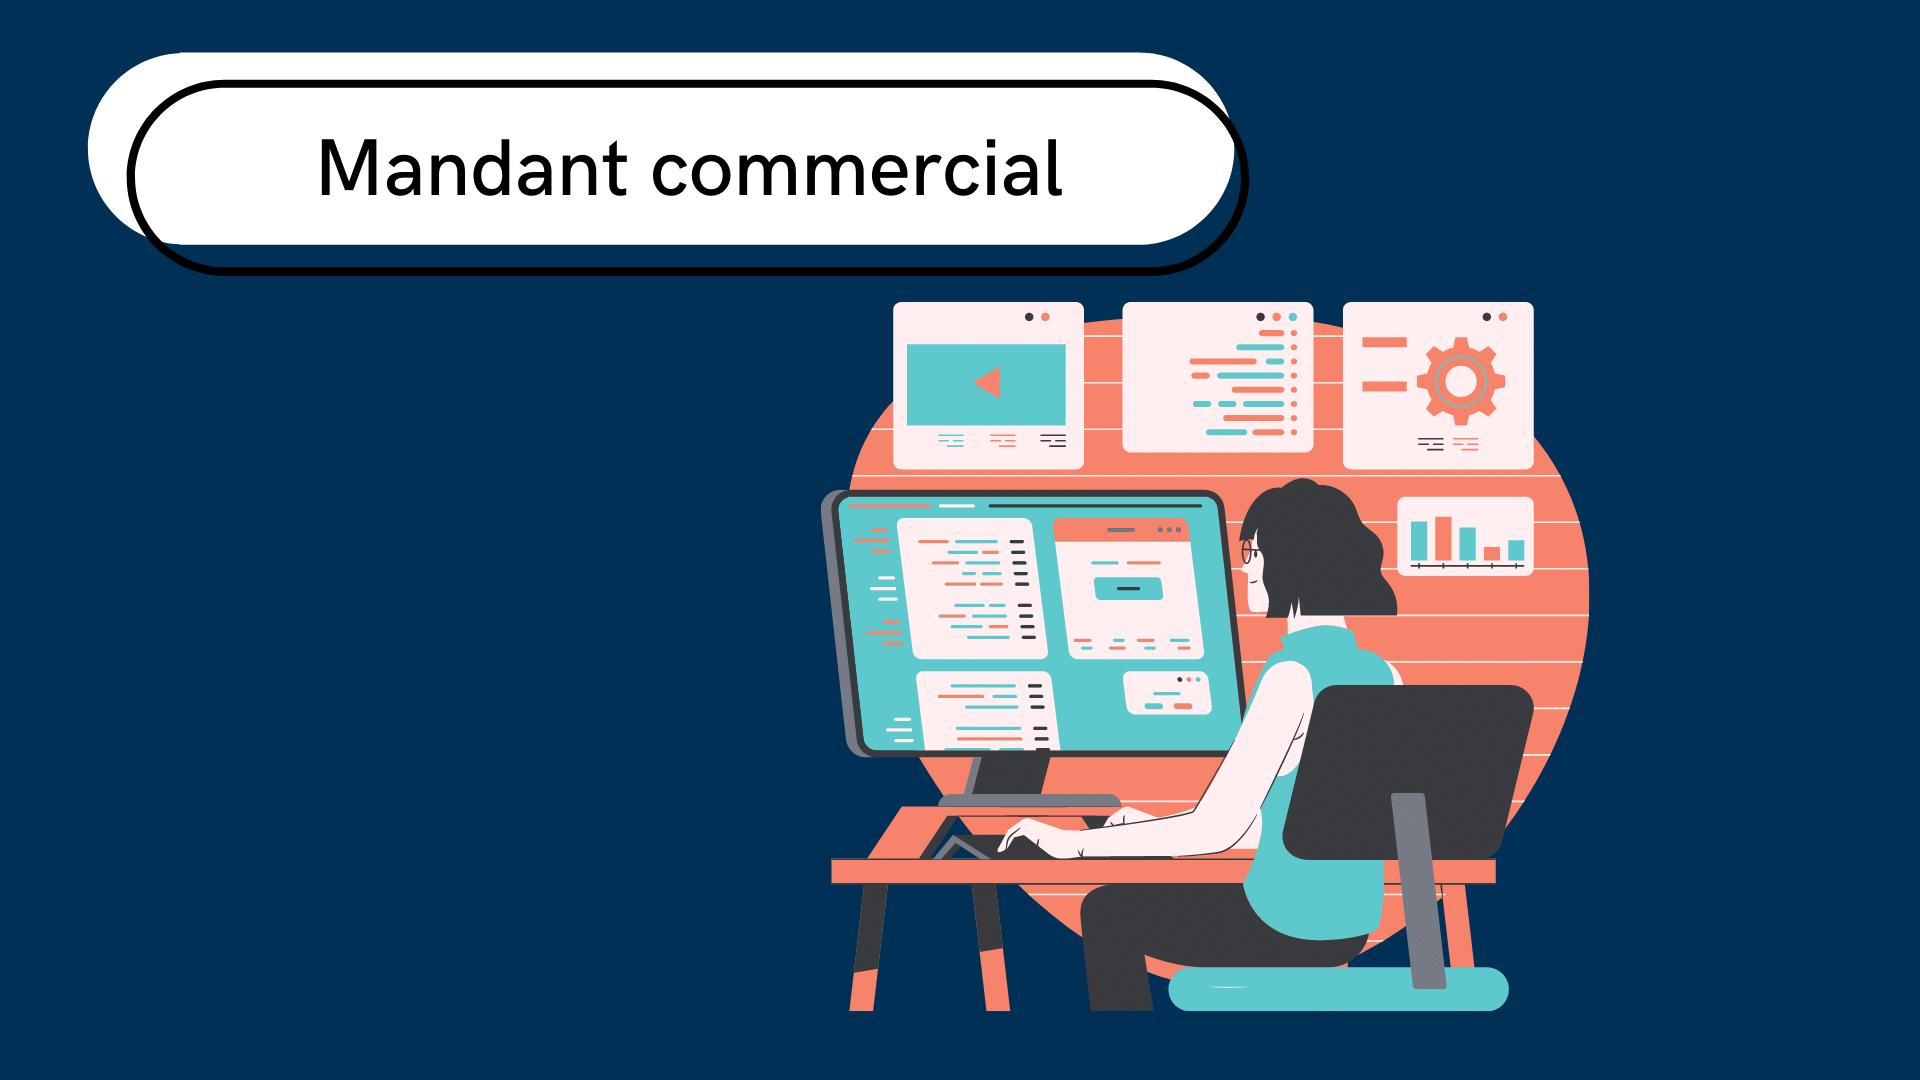 Mandant commercial